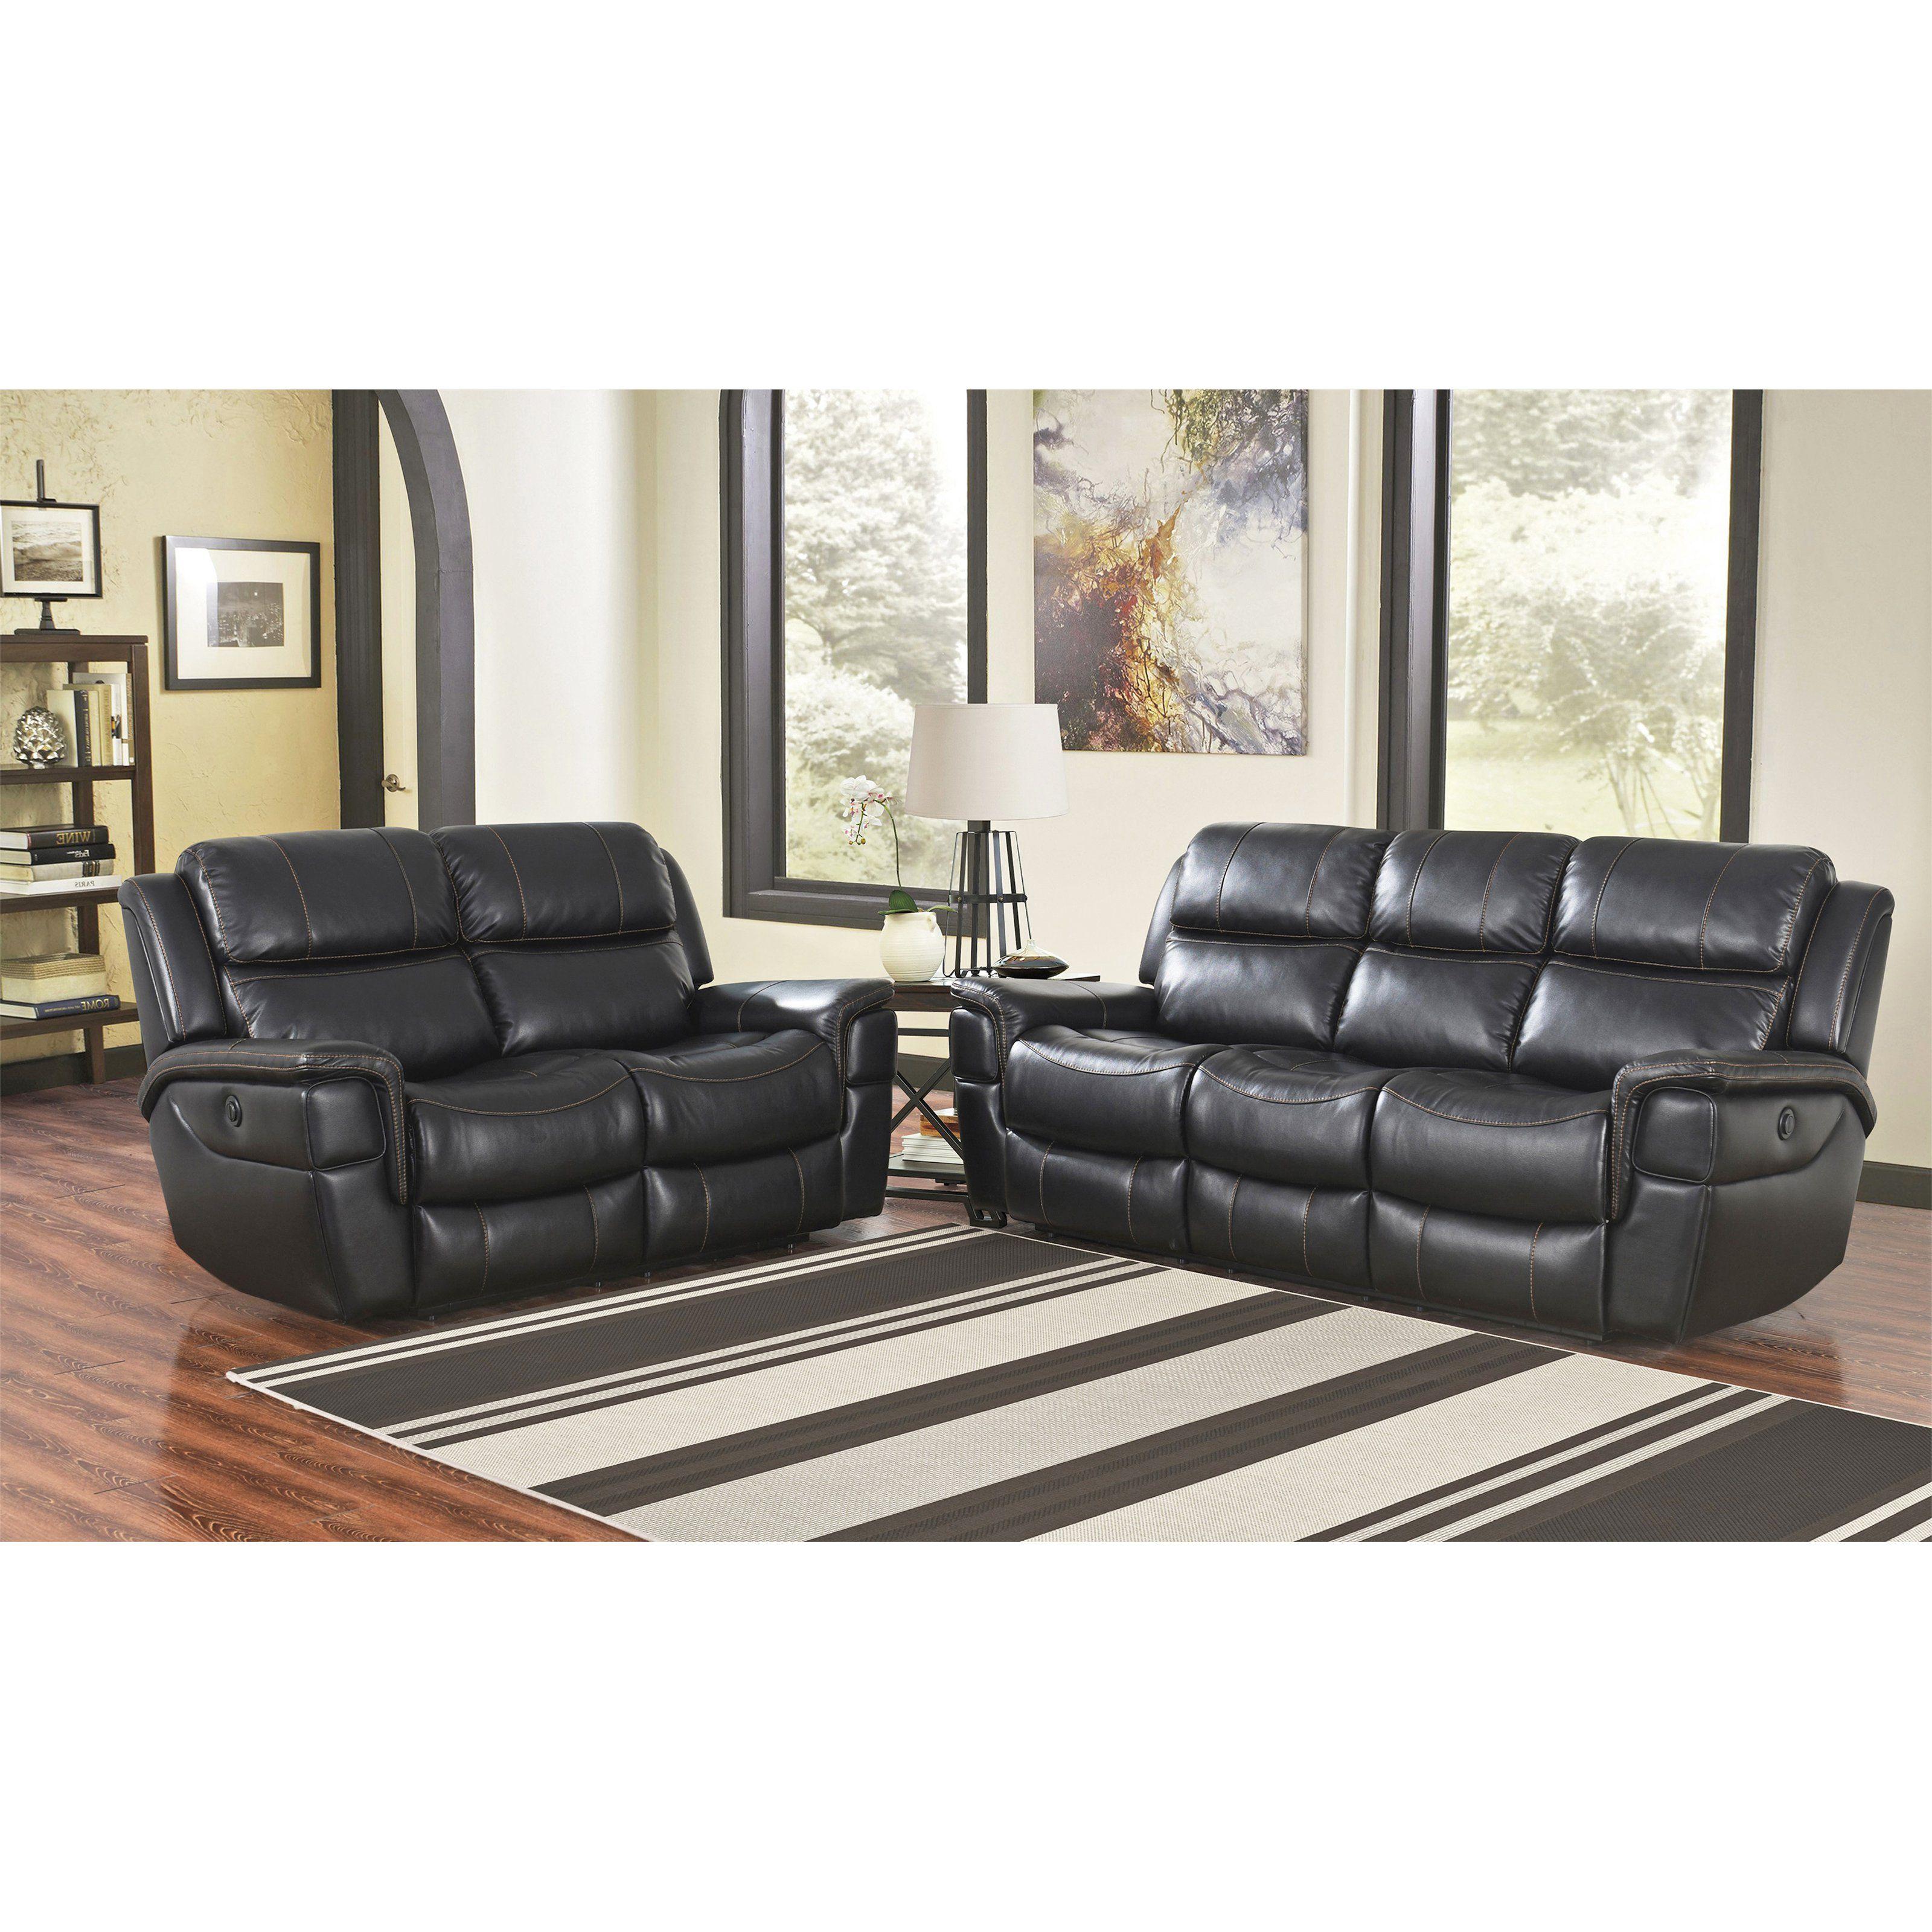 ryker reclining sofa and loveseat 2 piece set white modern bed abbyson tallia power sk 1298 blk p3 langdon black living room foam